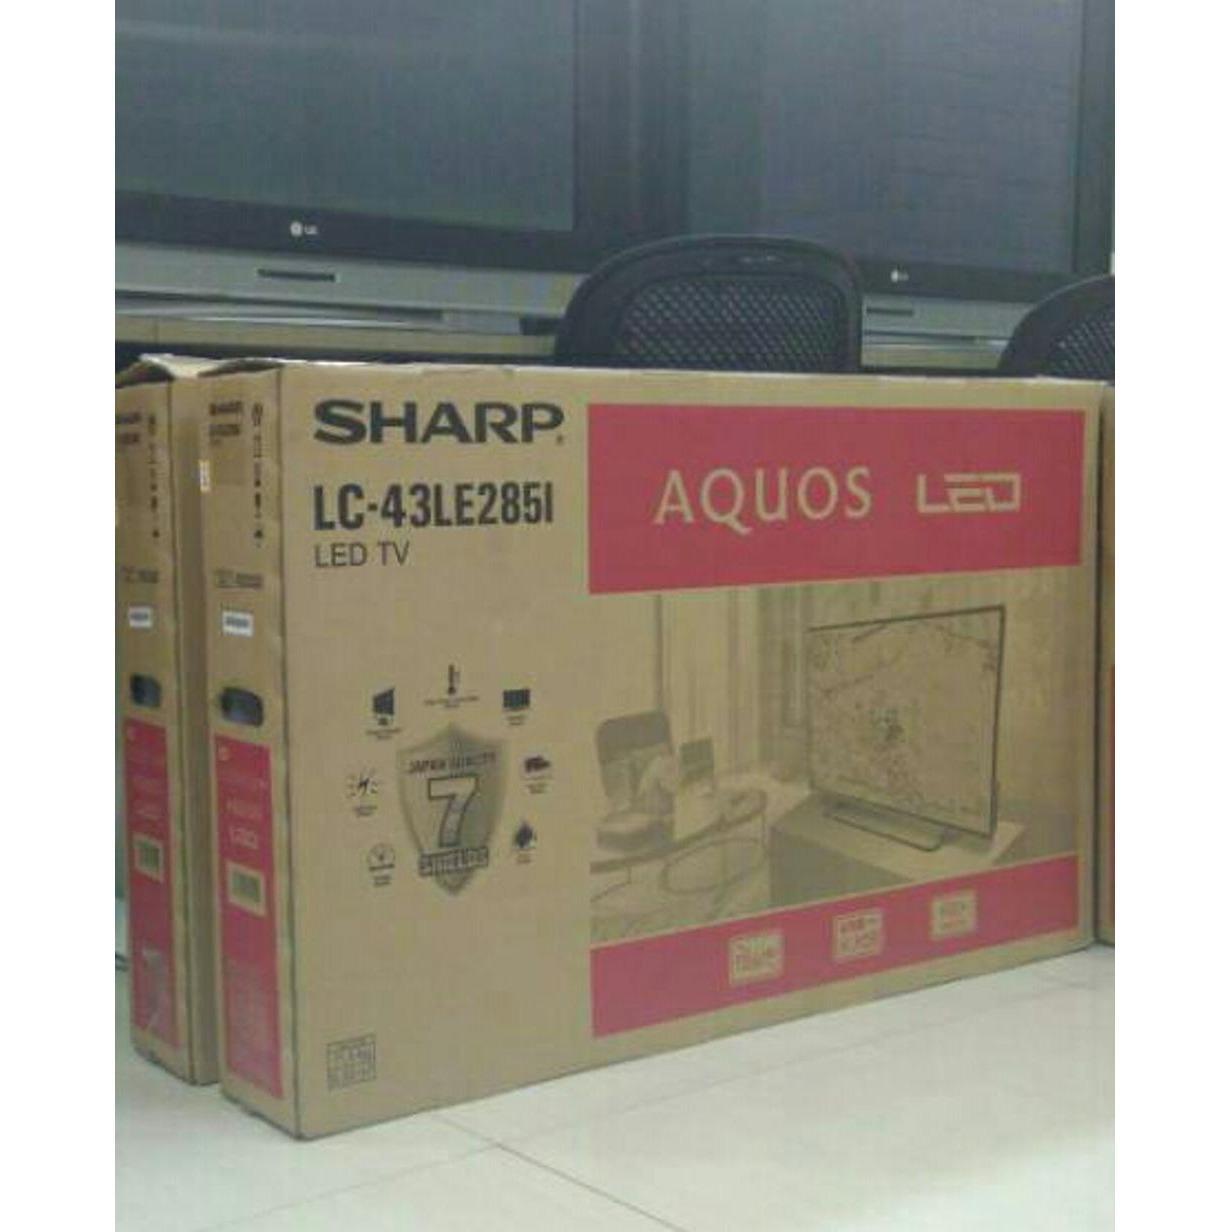 Sharp Aquos LC-32LE260 LED TV [32 Inch]